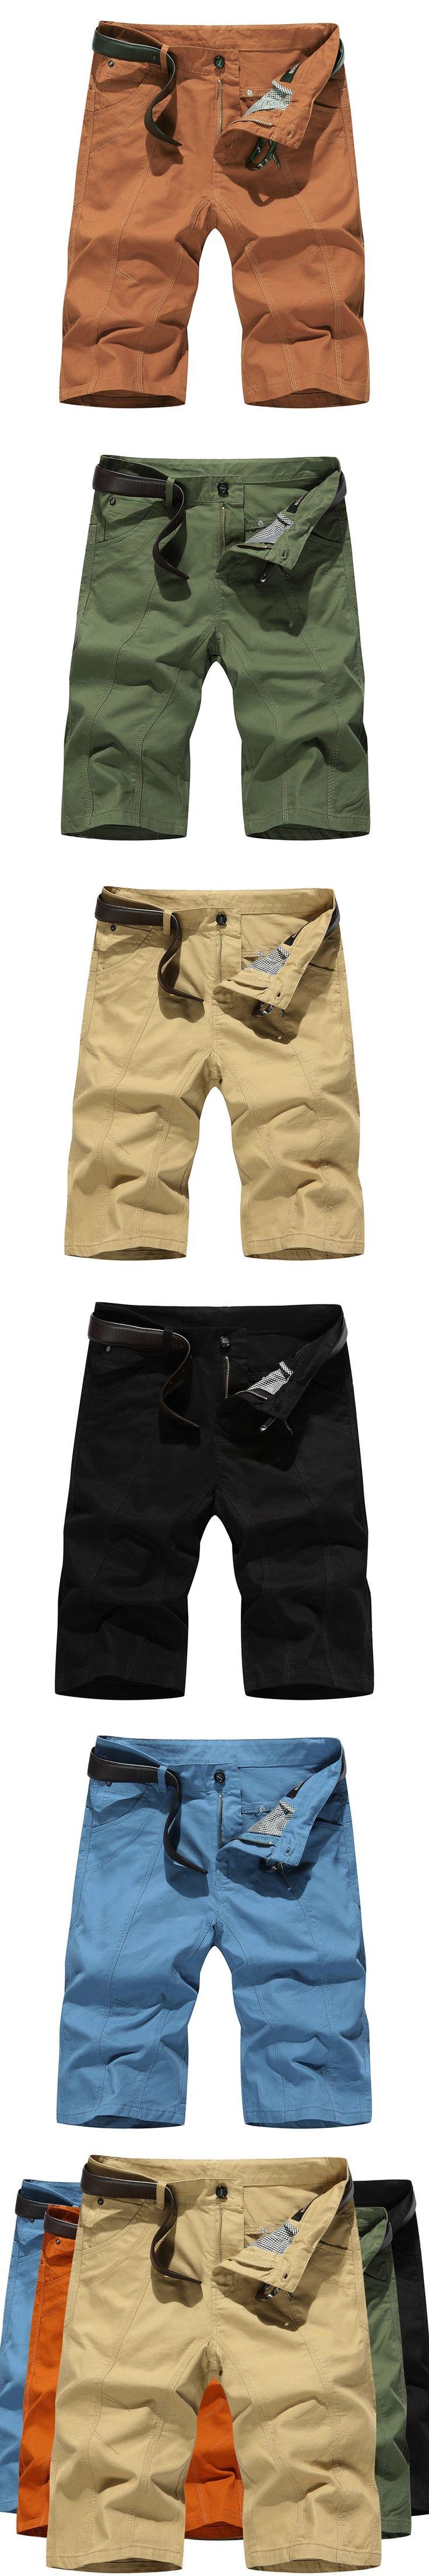 Bermuda Shorts Men Brand Men Shorts Casual Slim Fit Youths Men Beach Shorts Homme Cargo Shorts Khaki Black